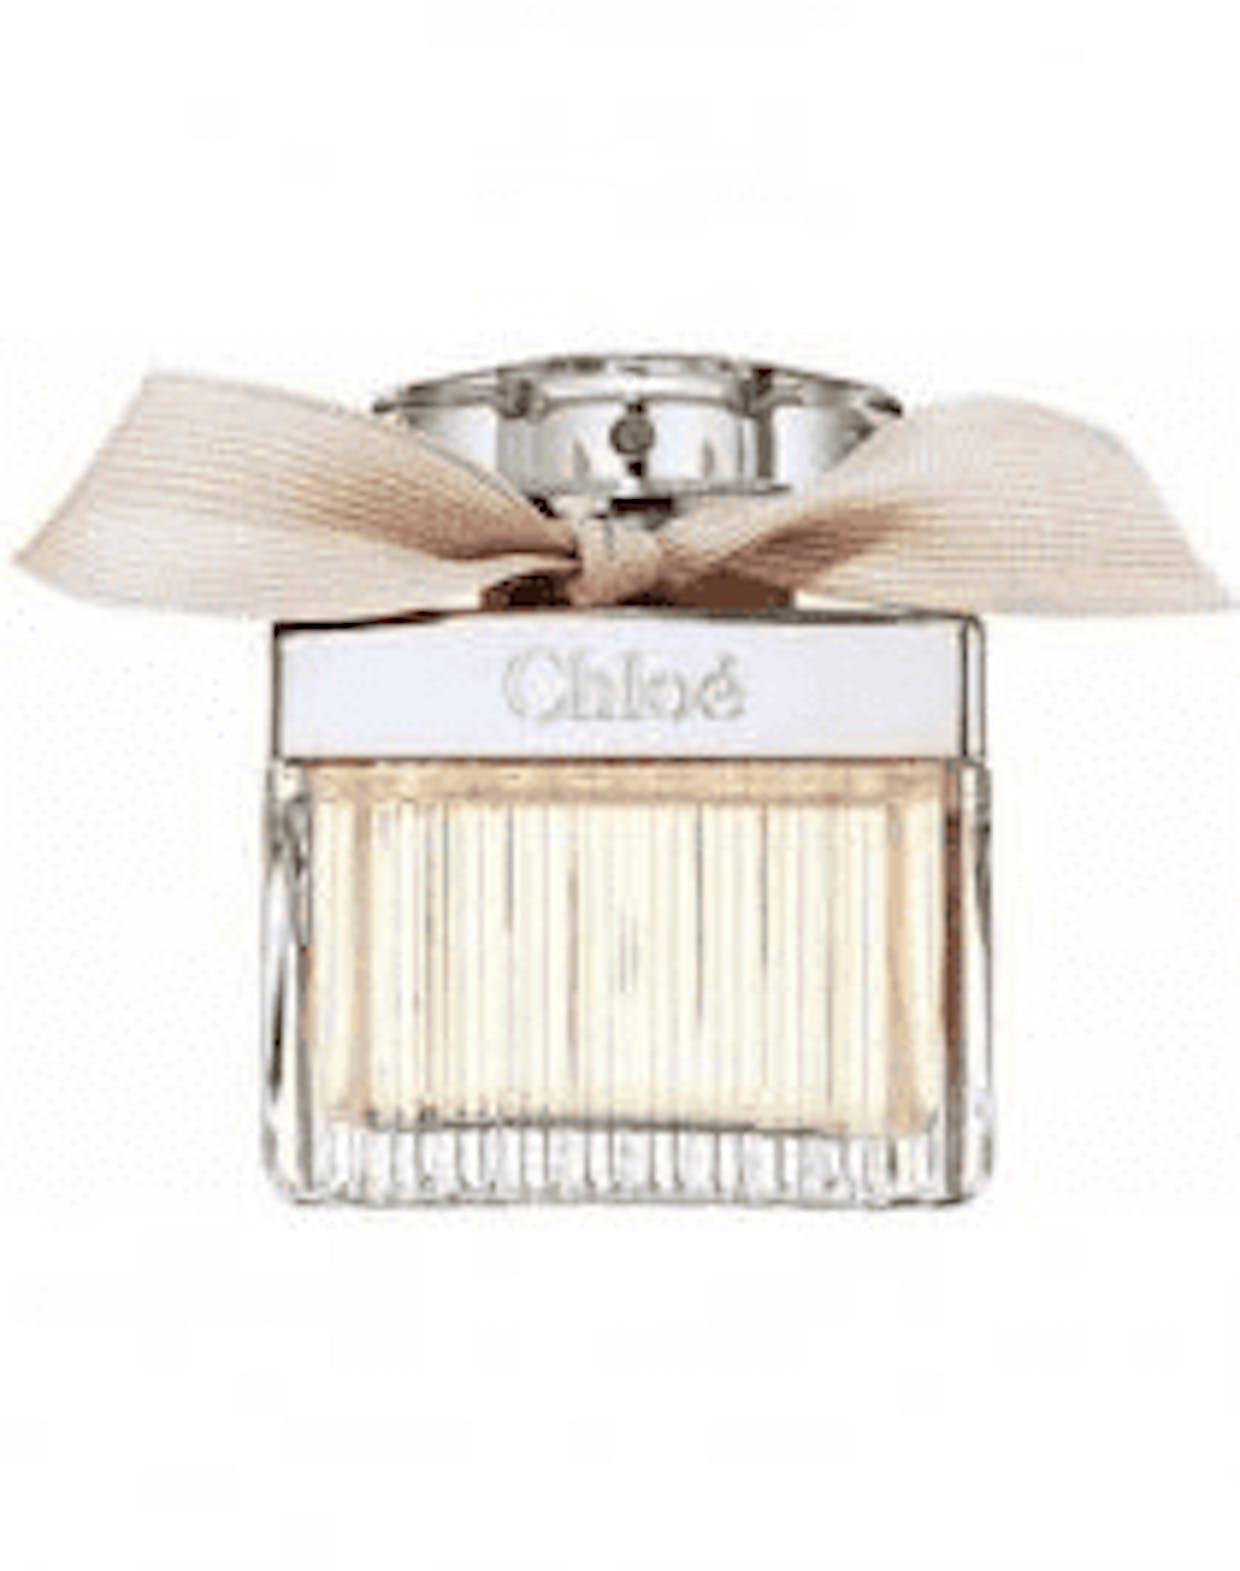 Kalian pake parfum apa beb? Wanginya kaya gimana?